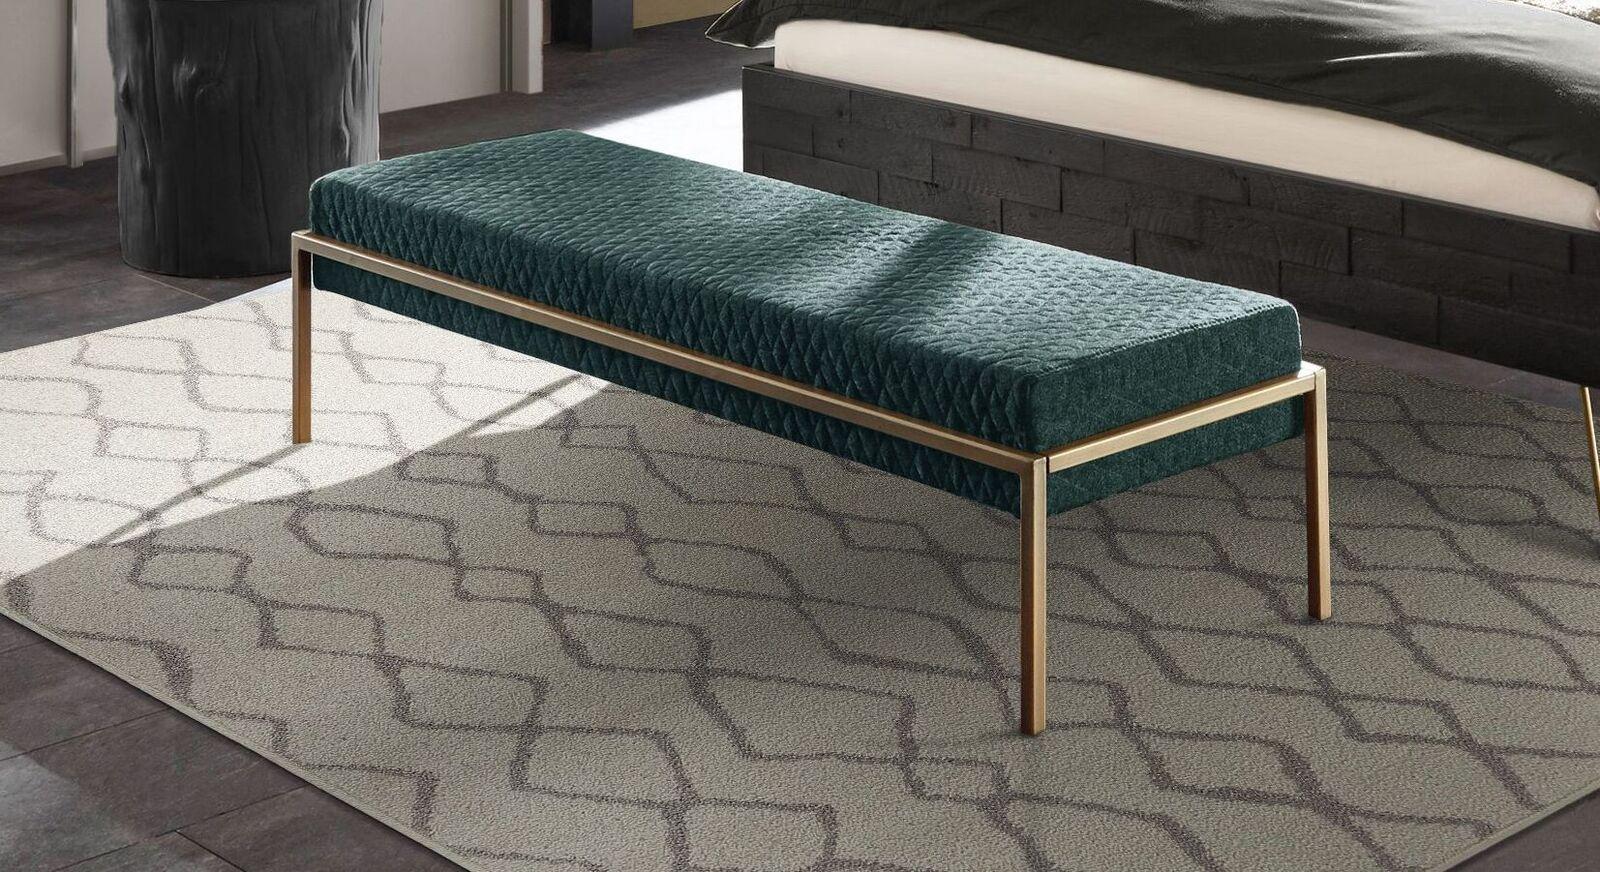 Bettbank Gran Rosario mit smaragdfarbenem Stoffbezug